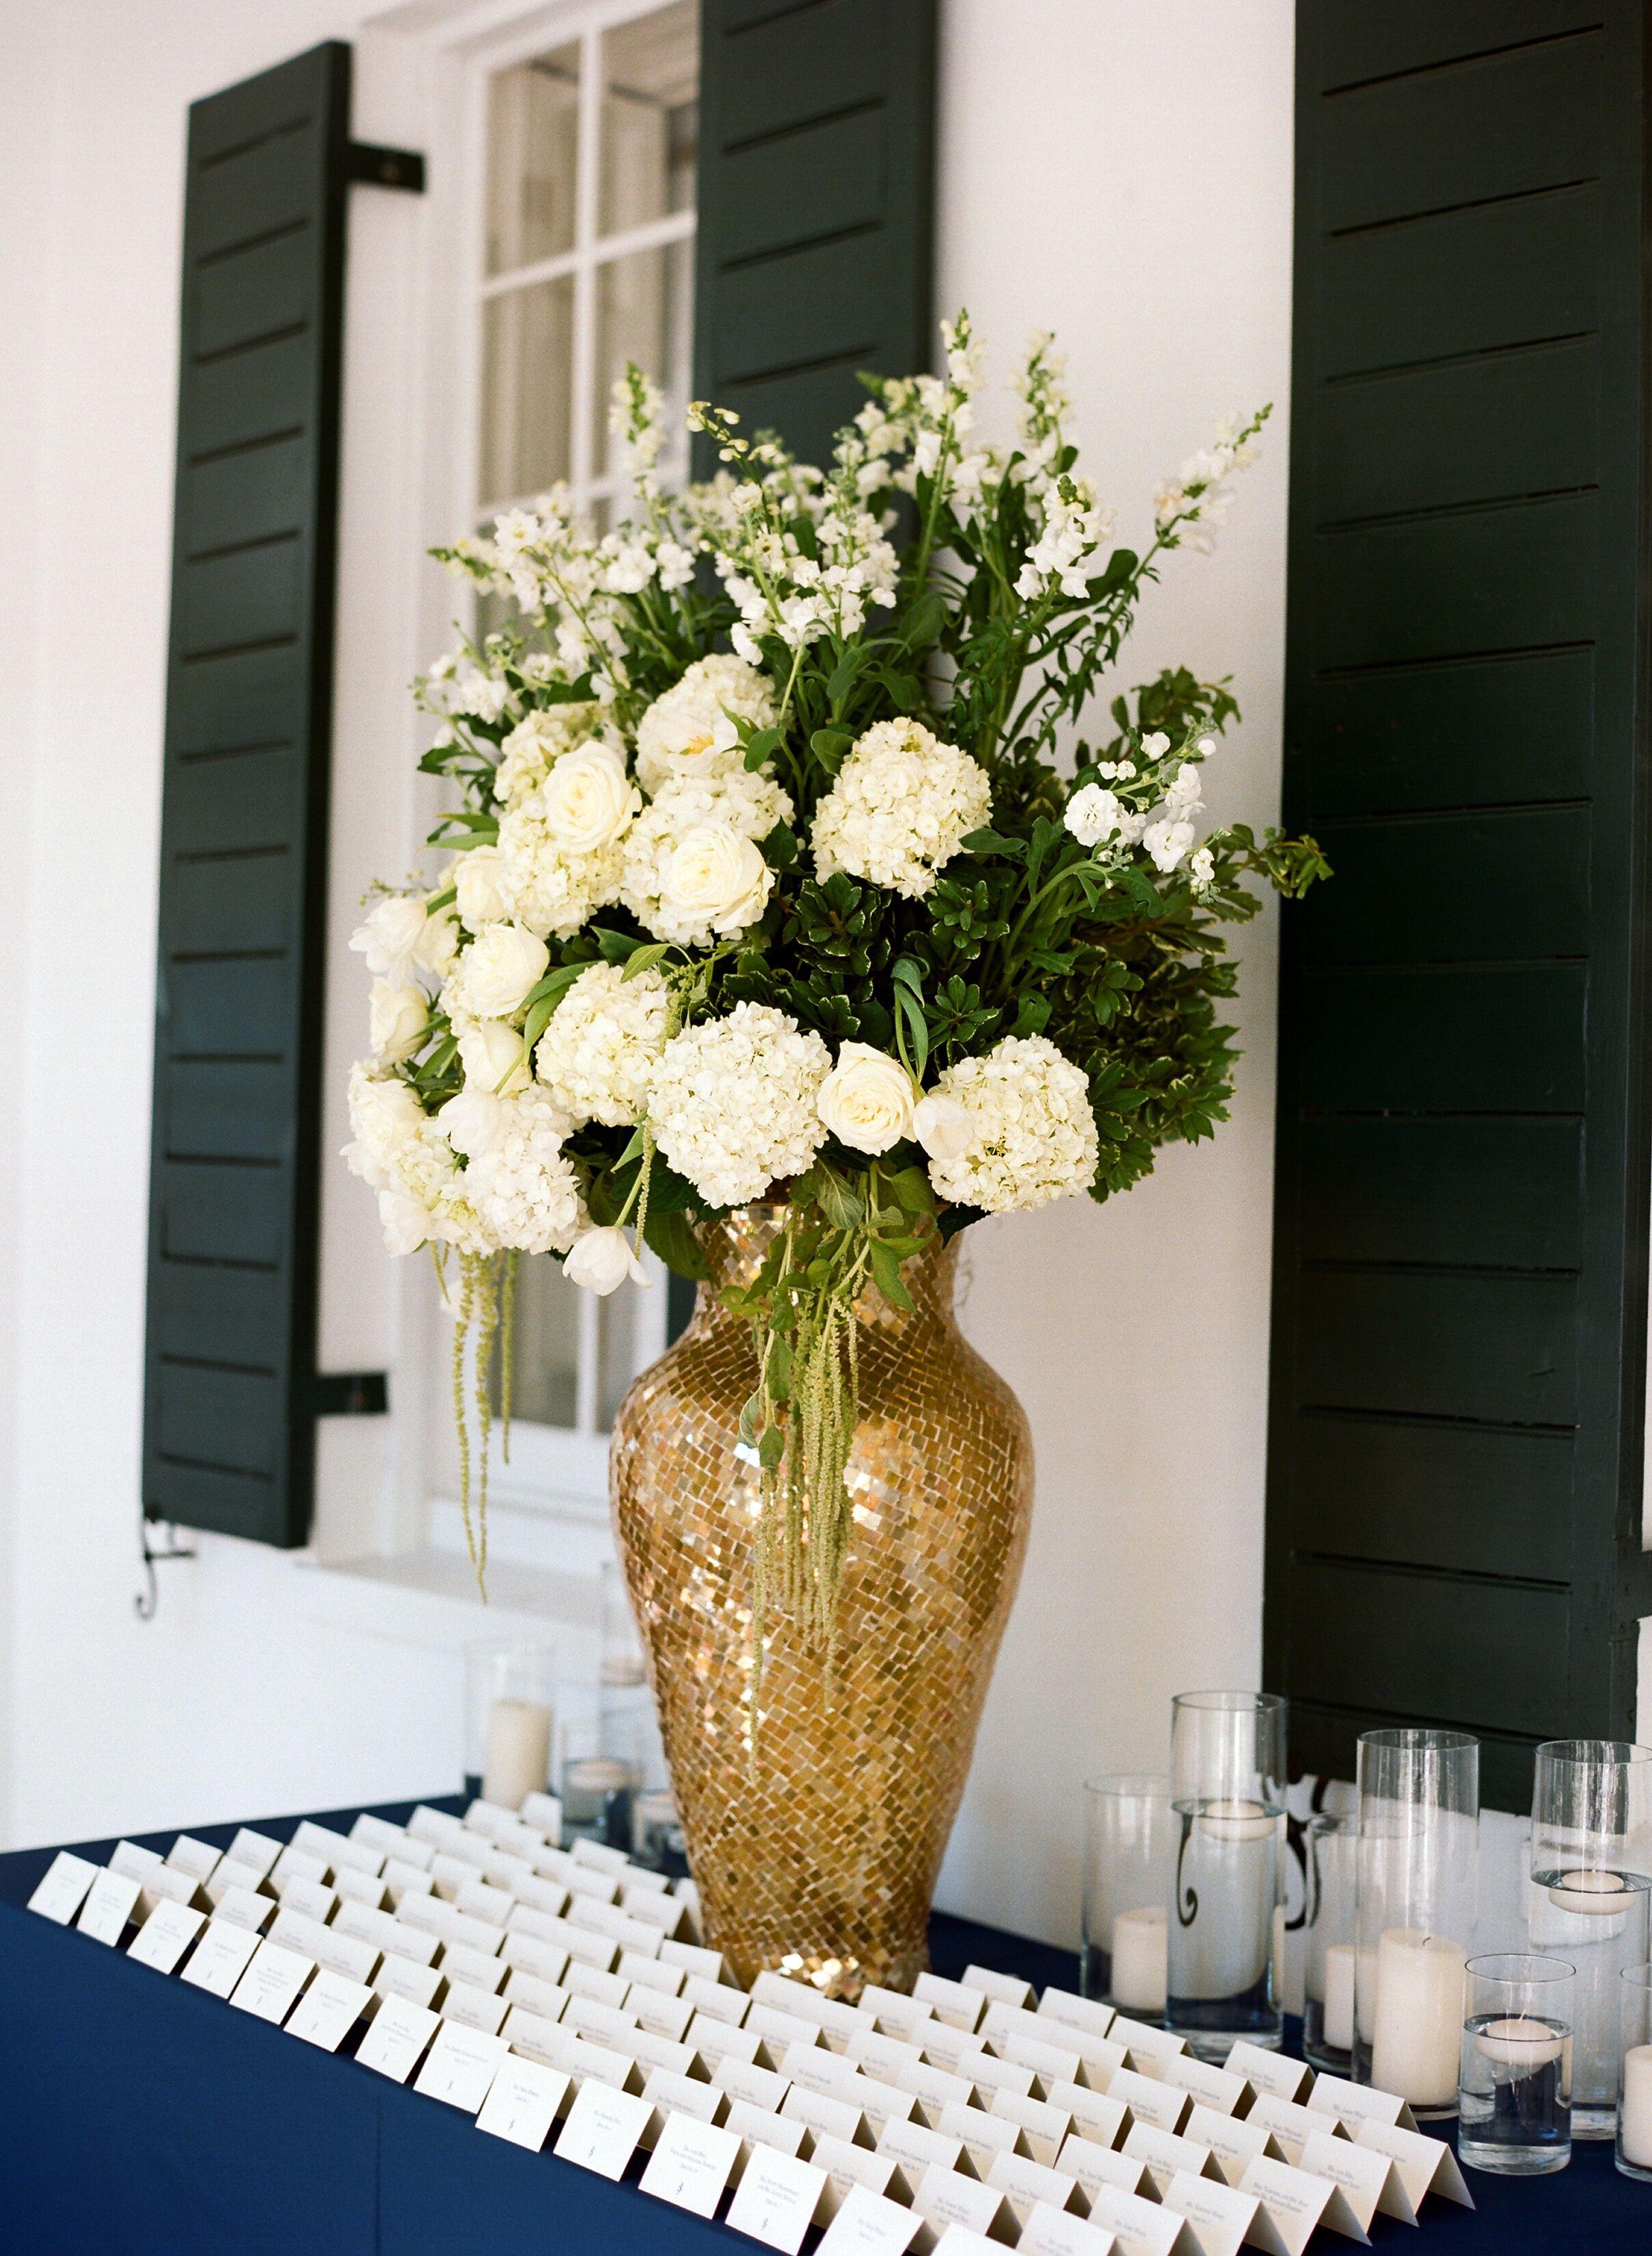 Escort Card Display Table With Mosaic Riser Vase